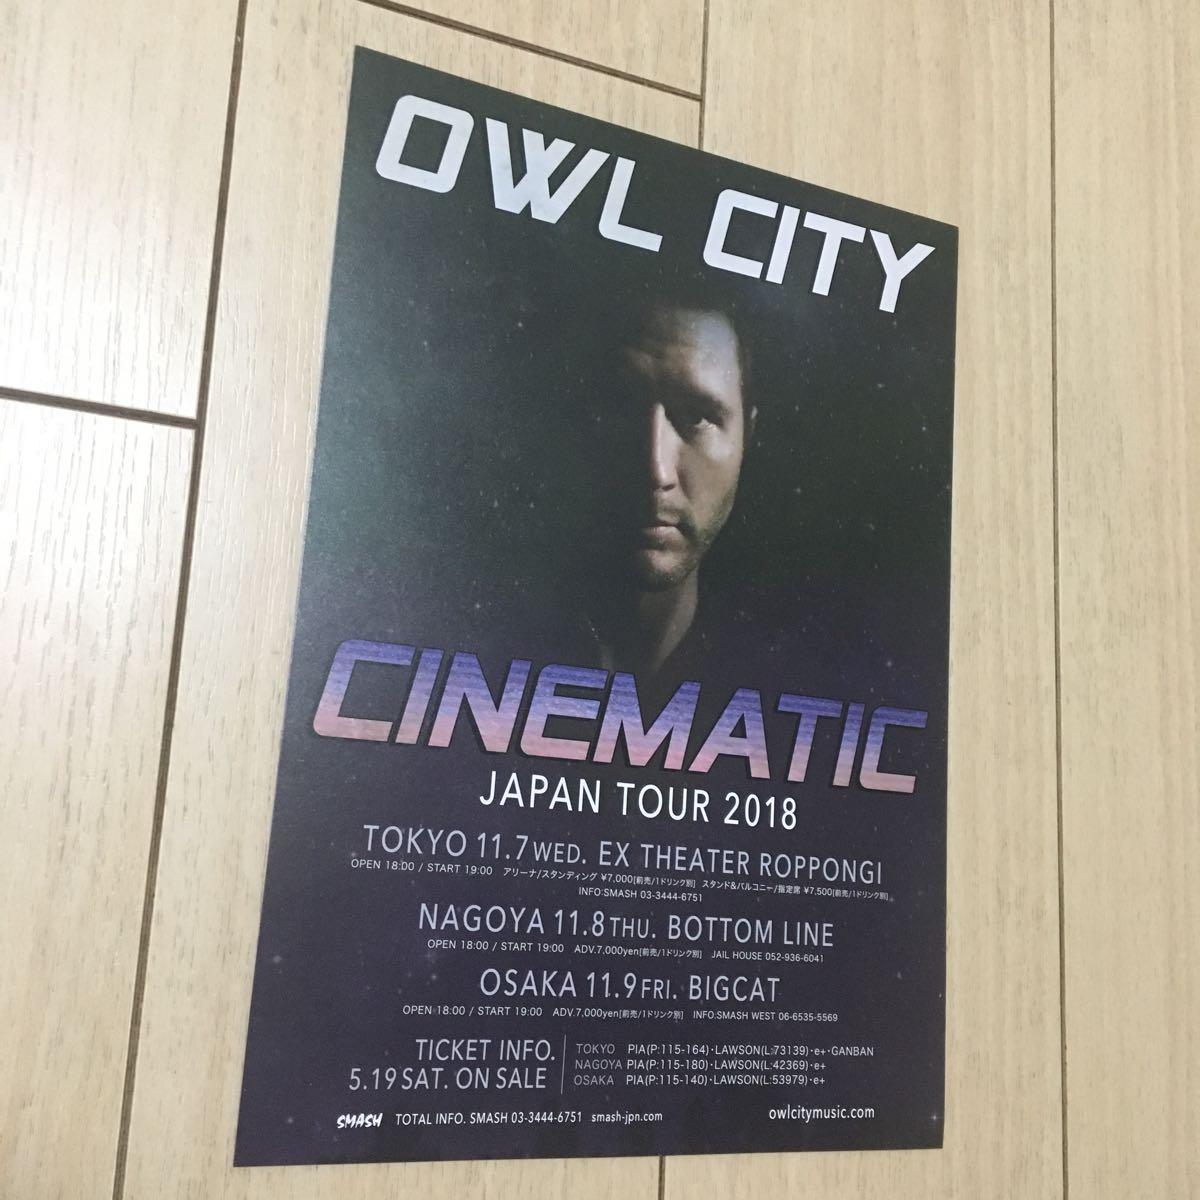 auru* City owl city  day Live notification leaflet 2018